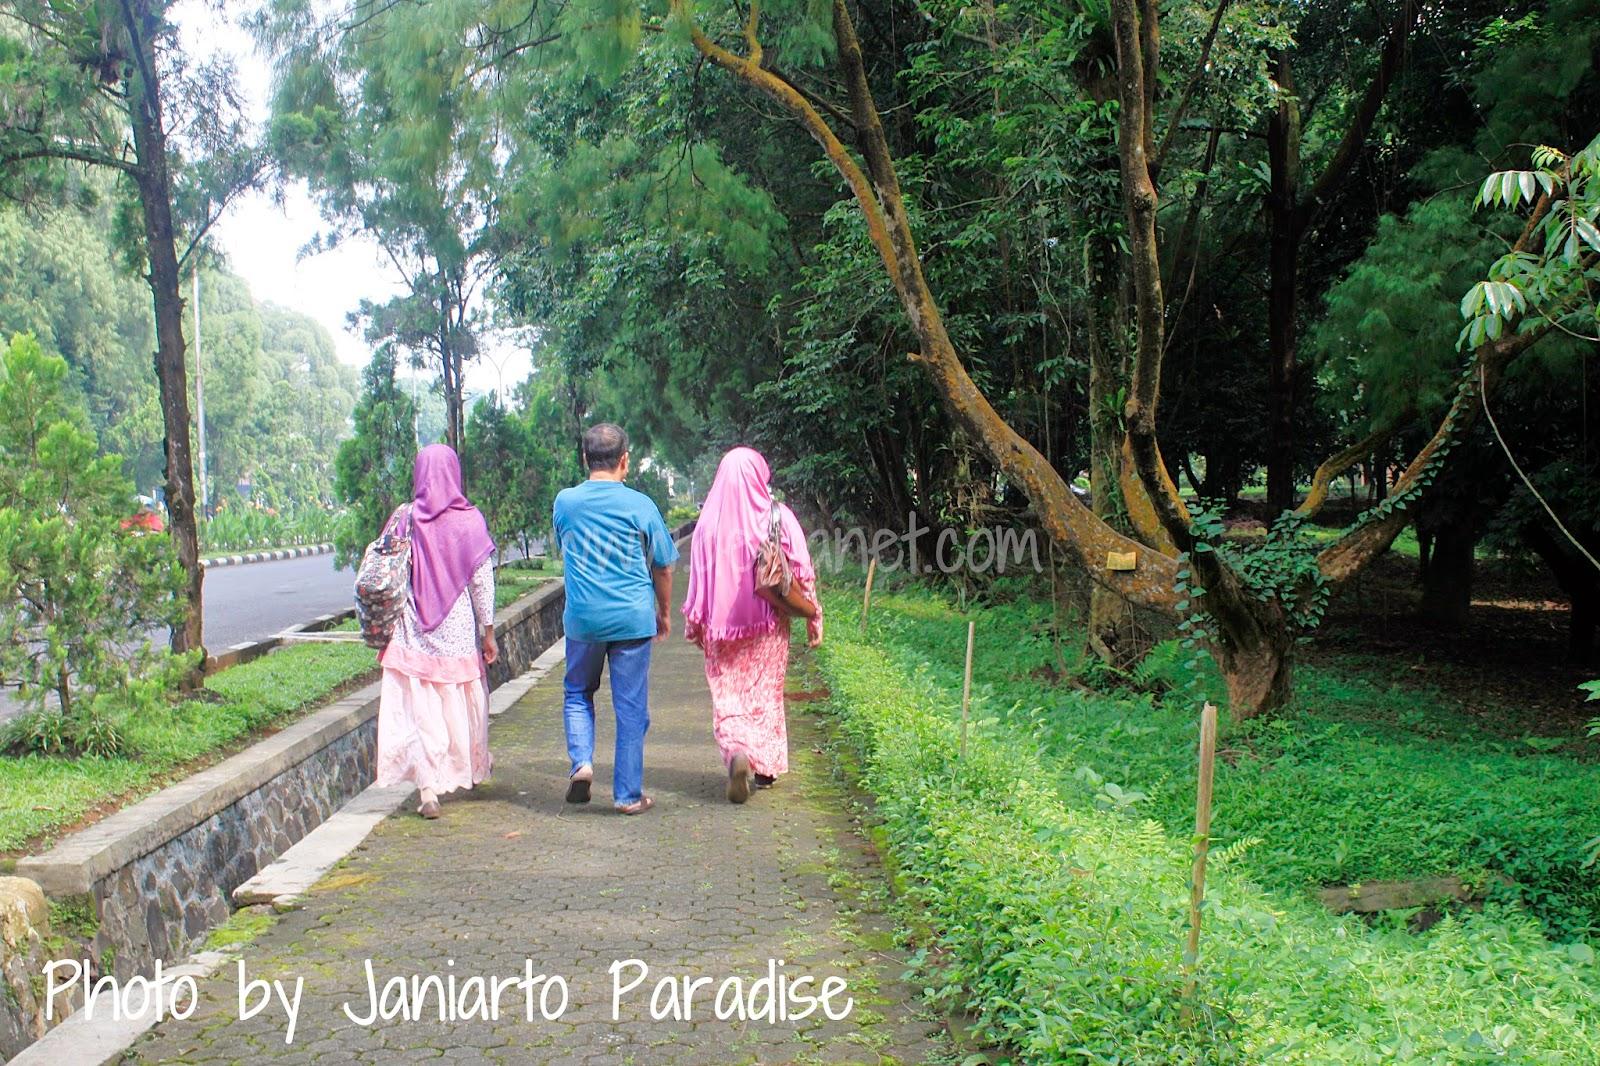 Puas Jalan Seharian Bersama Keluarga